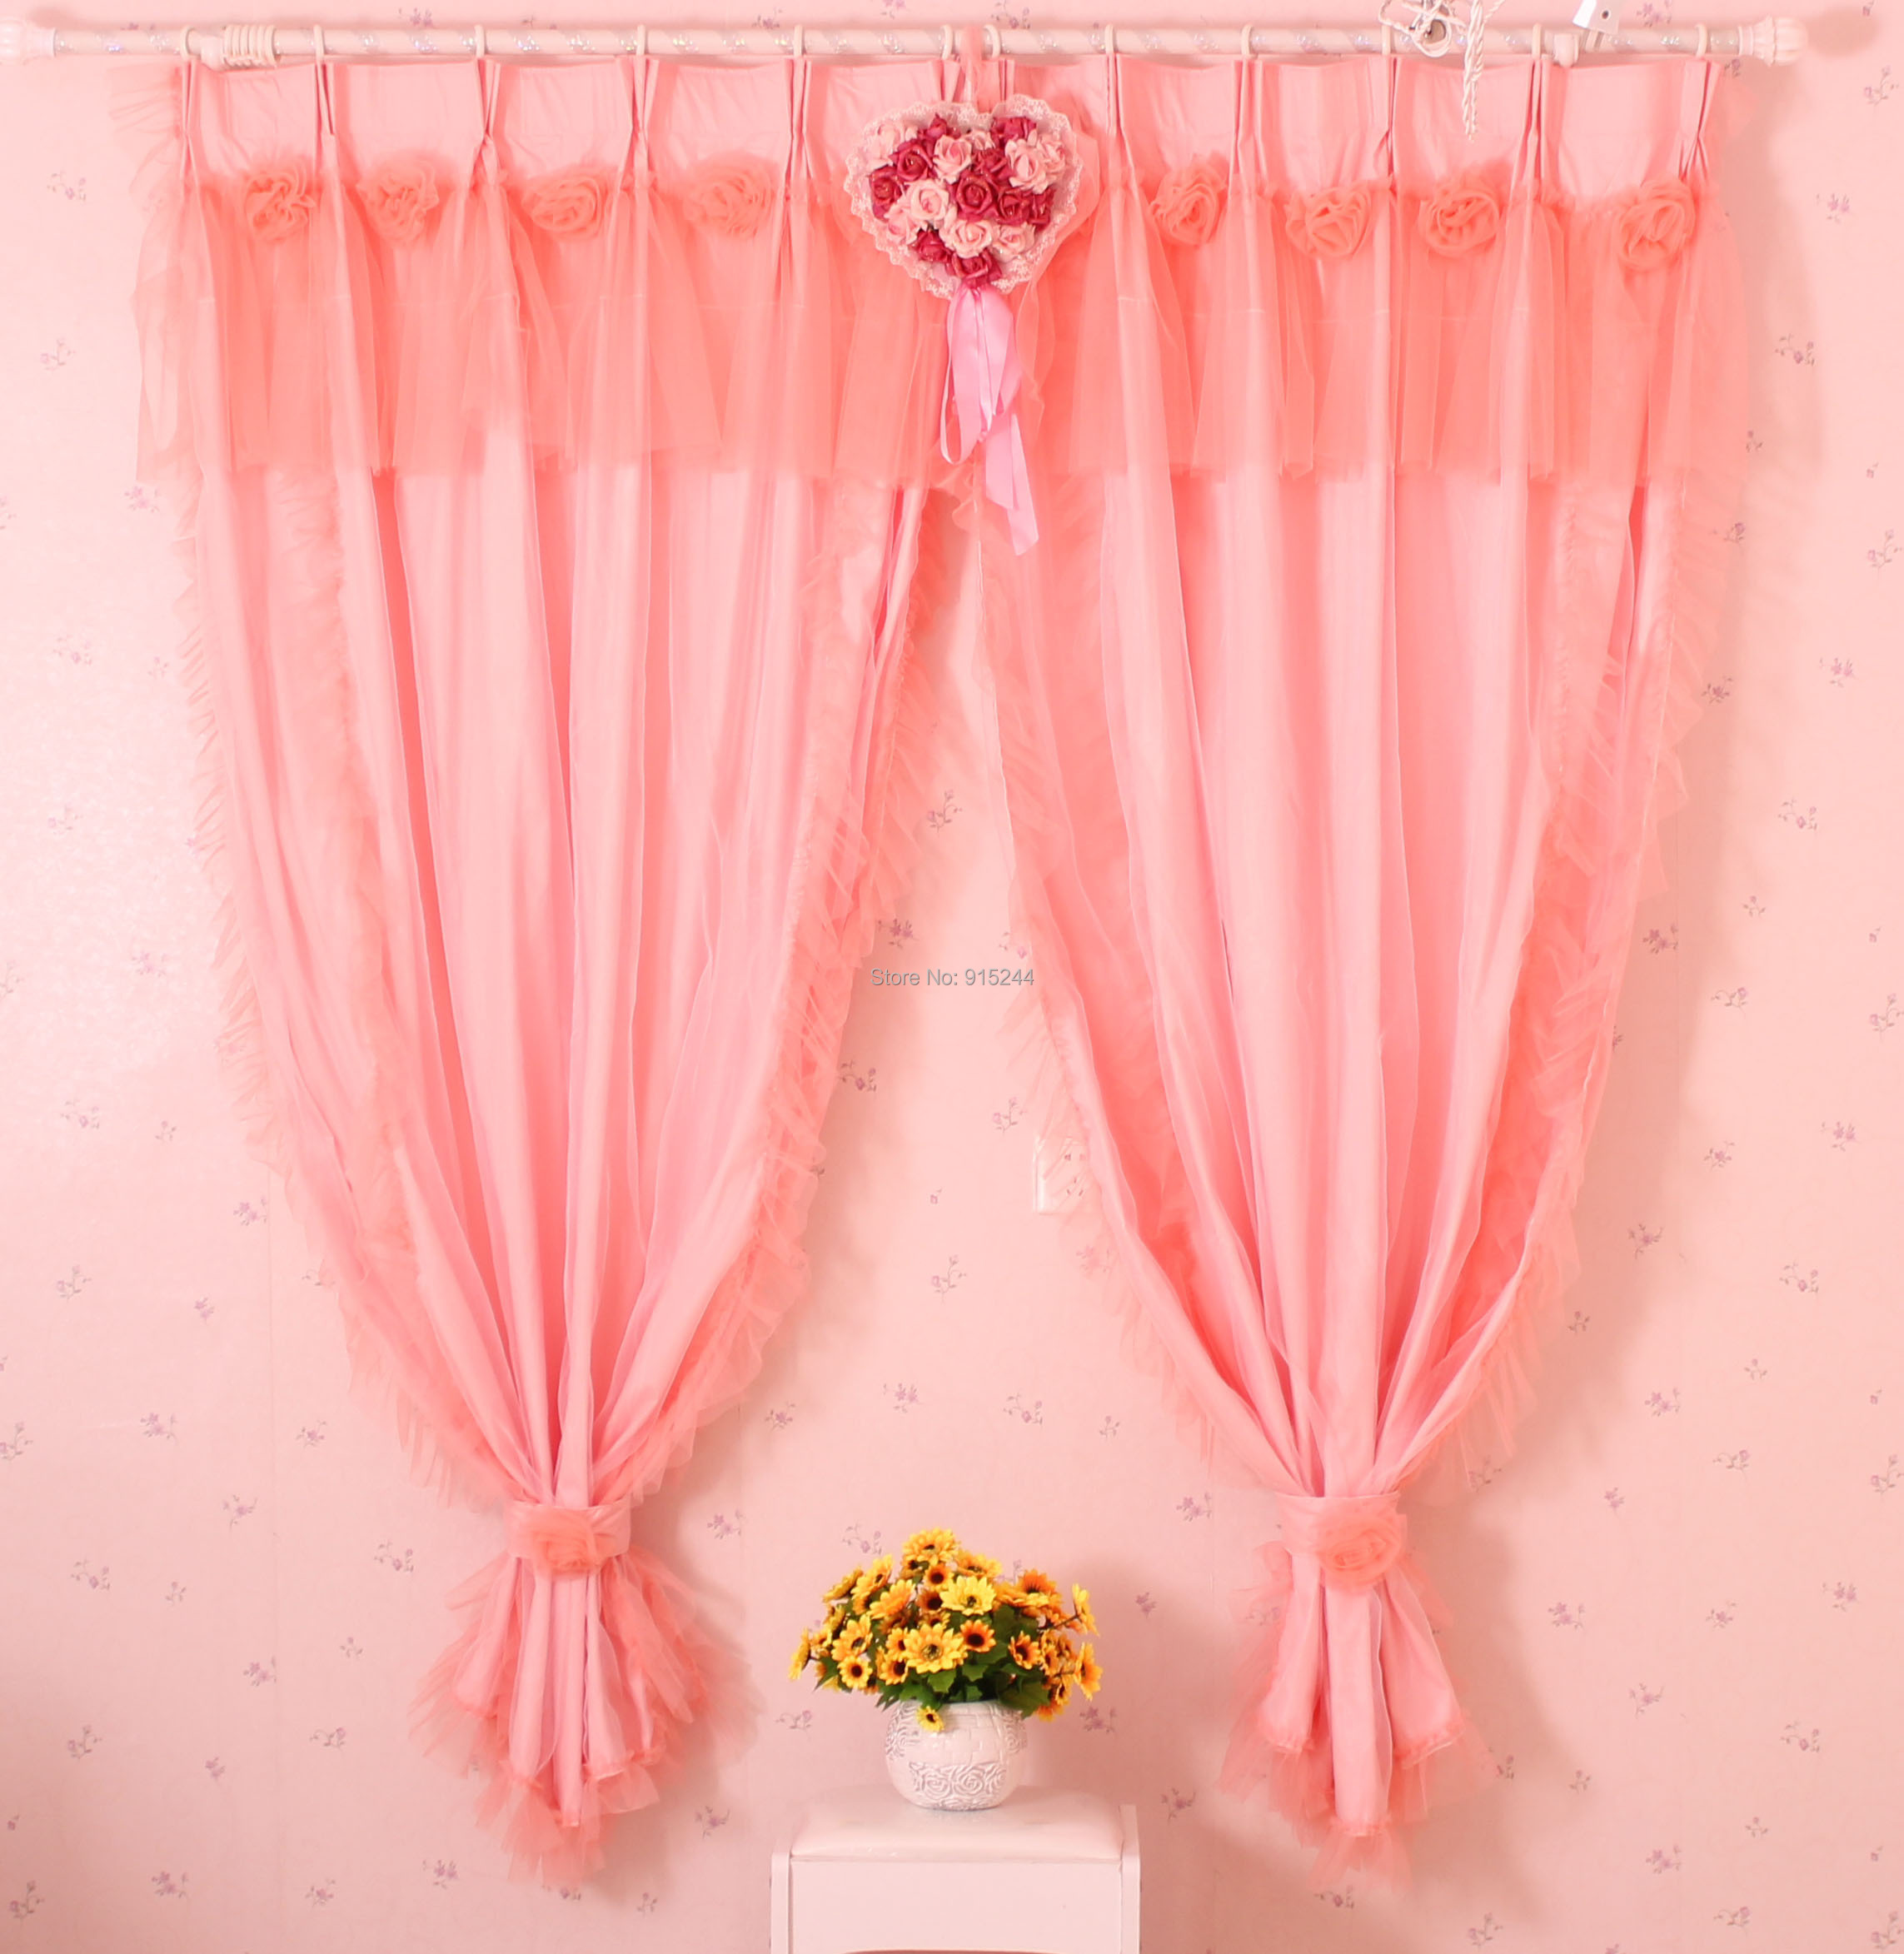 princesa cortina rstica blanco rosa rojo pruple azul de rose del cordn de algodn textiles para